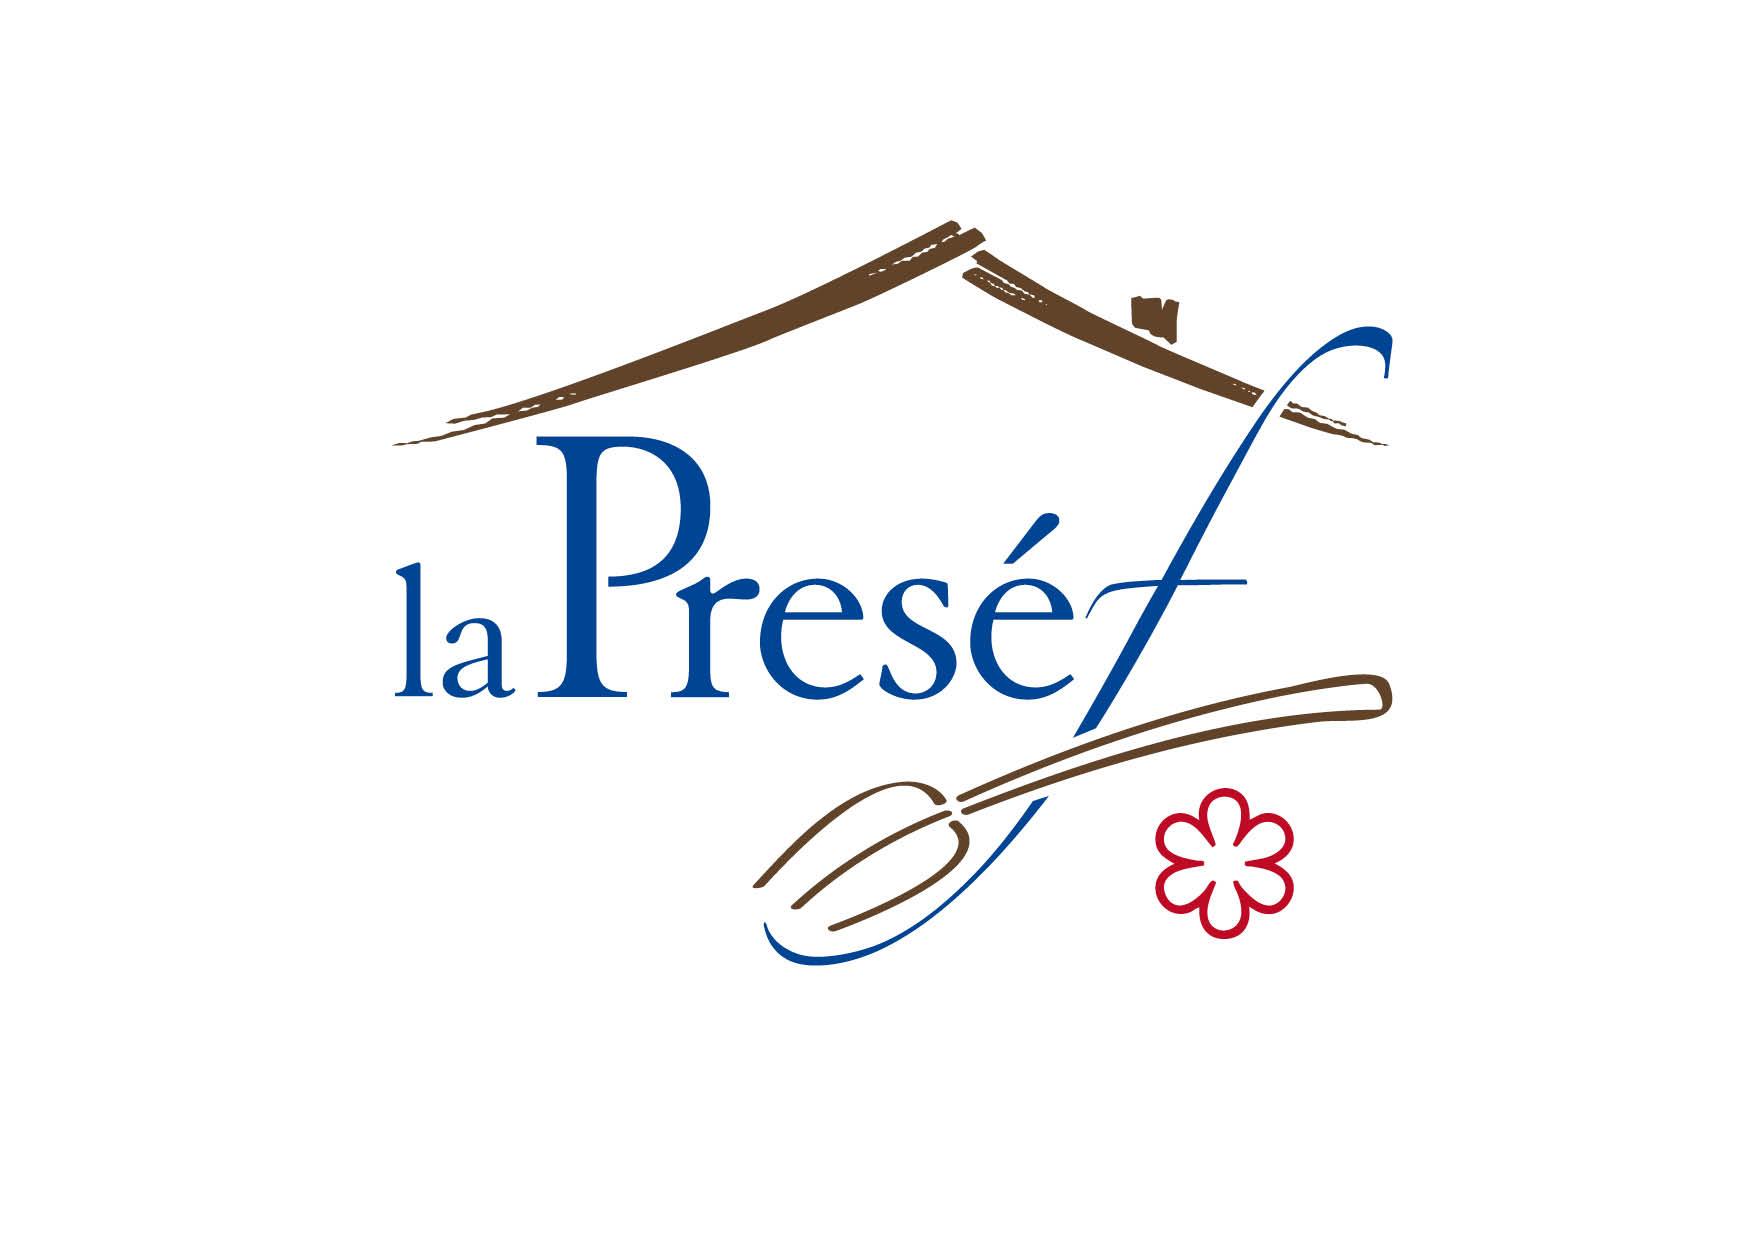 presef logo stella